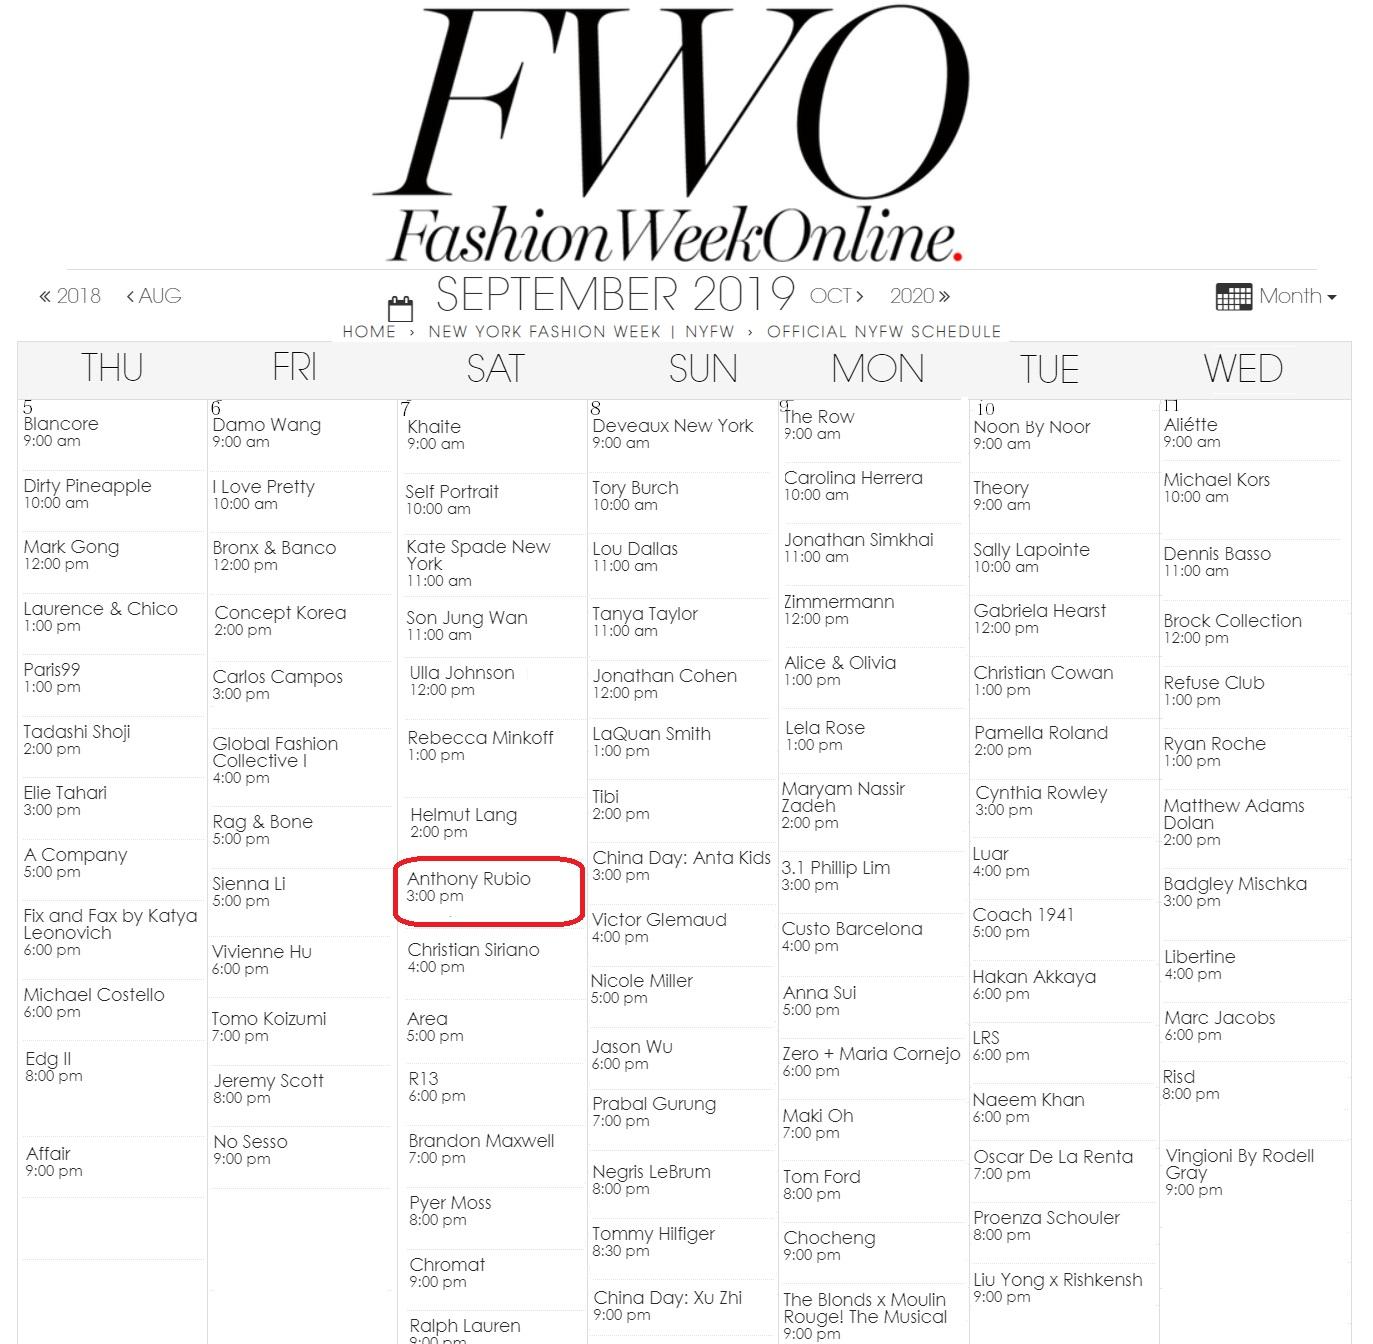 Anthony Rubio on the Fashion Week calendar